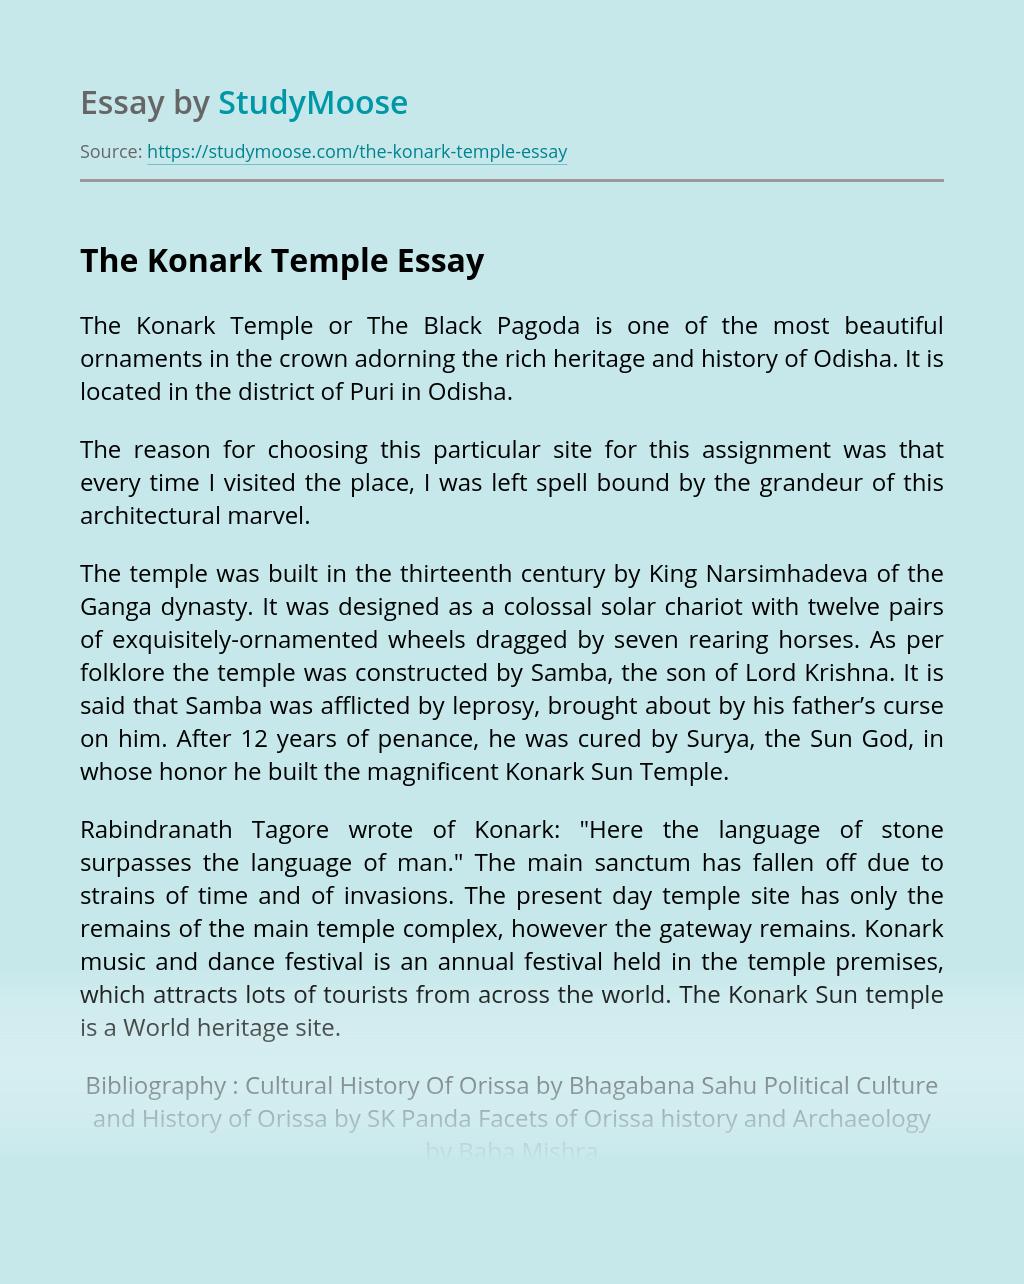 The Konark Temple